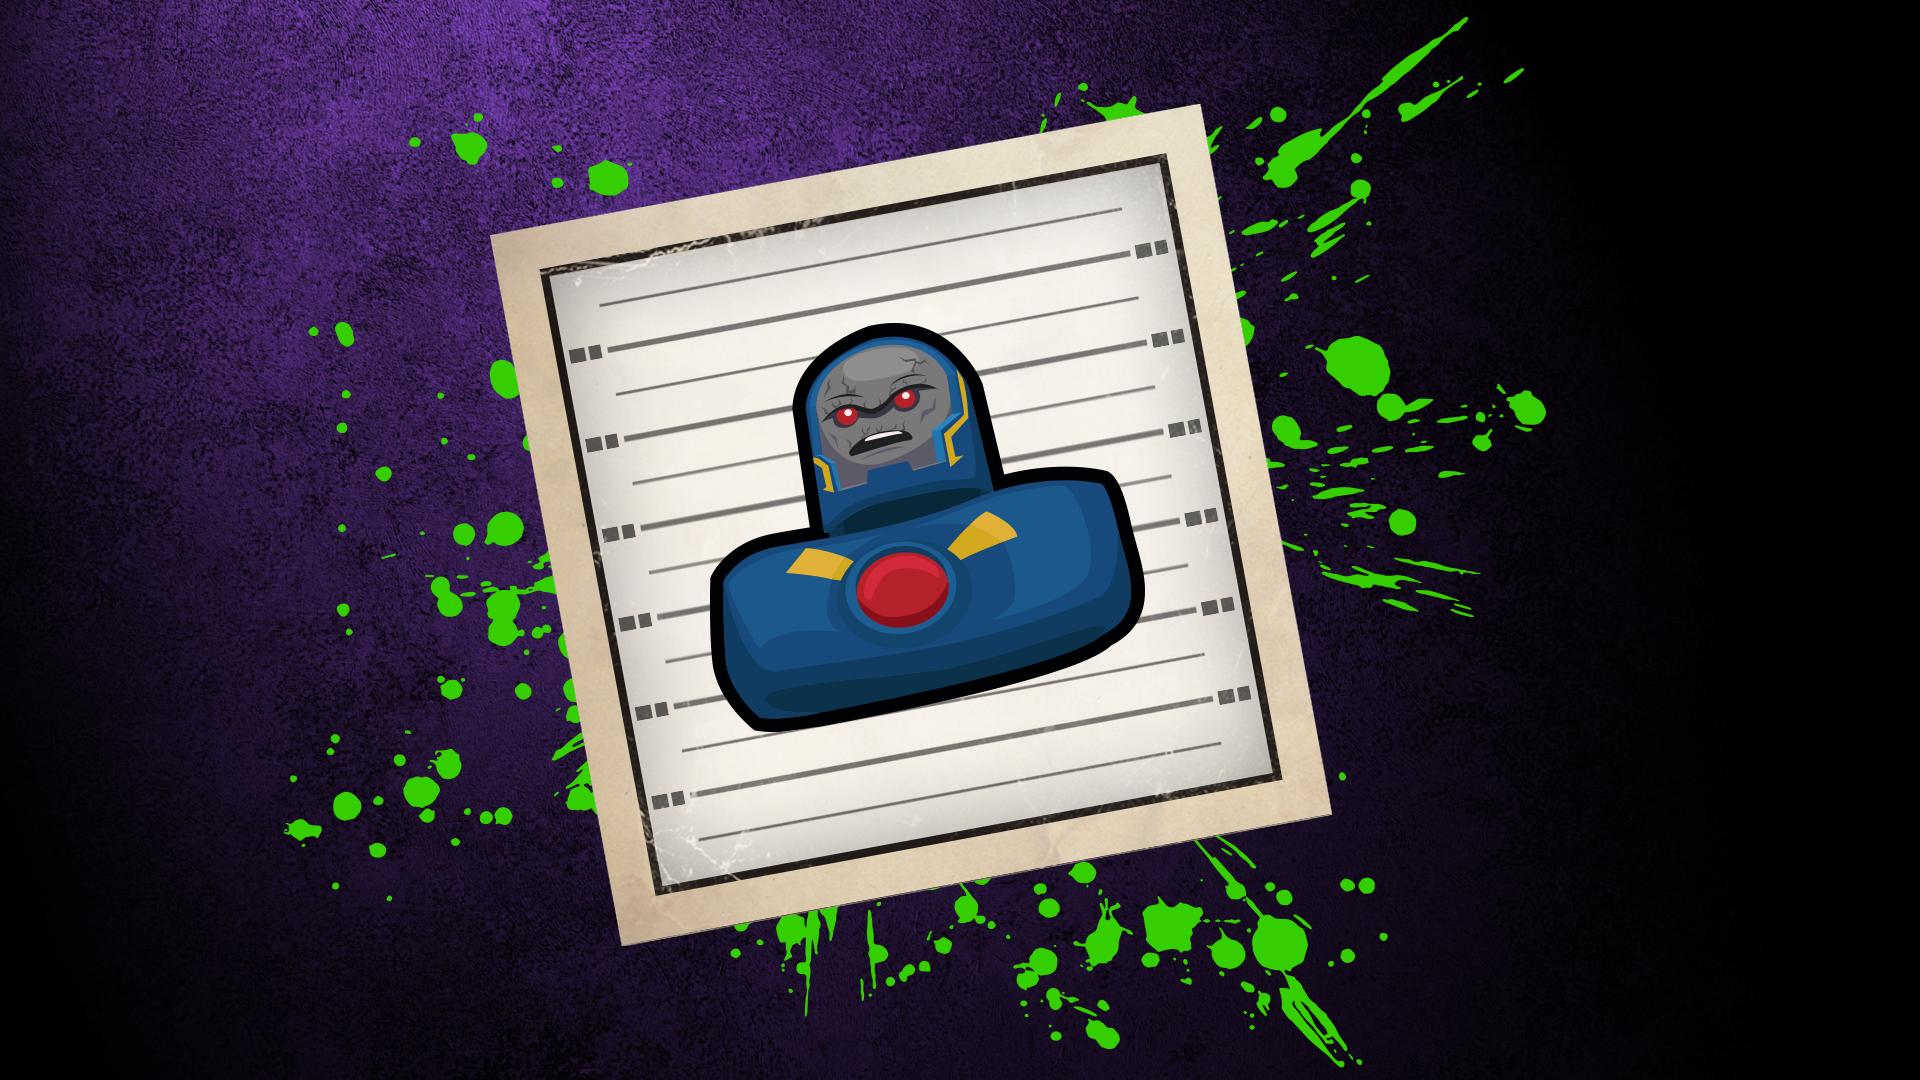 Icon for Deceiving Darkseid